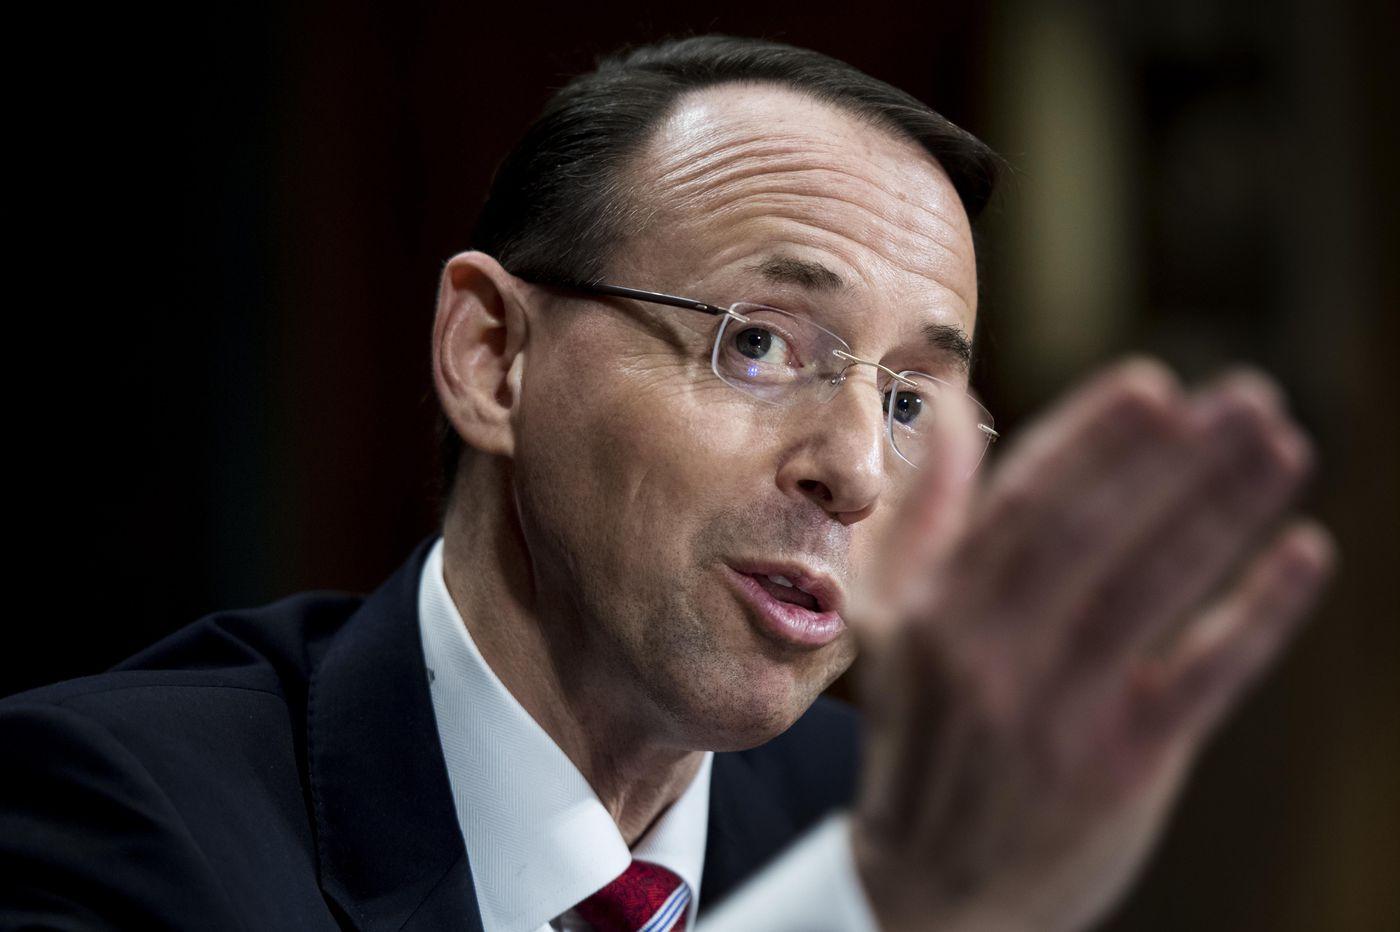 Rod Rosenstein defends William Barr's handling of Mueller report